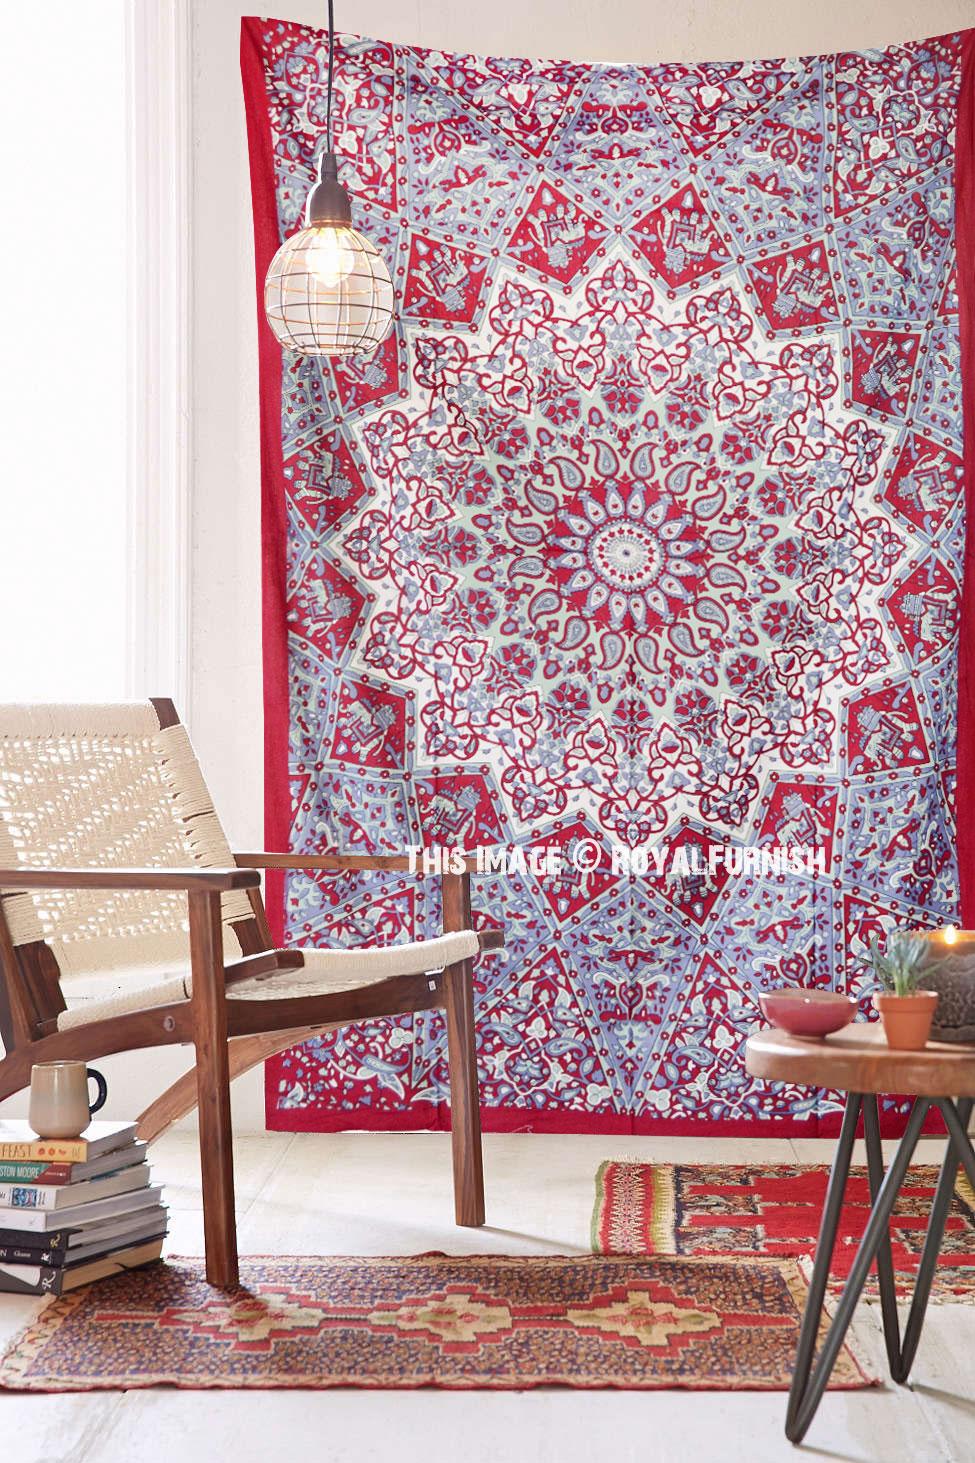 Blue multi elephants sun ombre mandala wall tapestry royalfurnish - Maroon Small Indian Dorm Decor Star Hippie Tapestry Wall Hanging Home Decor Art Royalfurnish Com